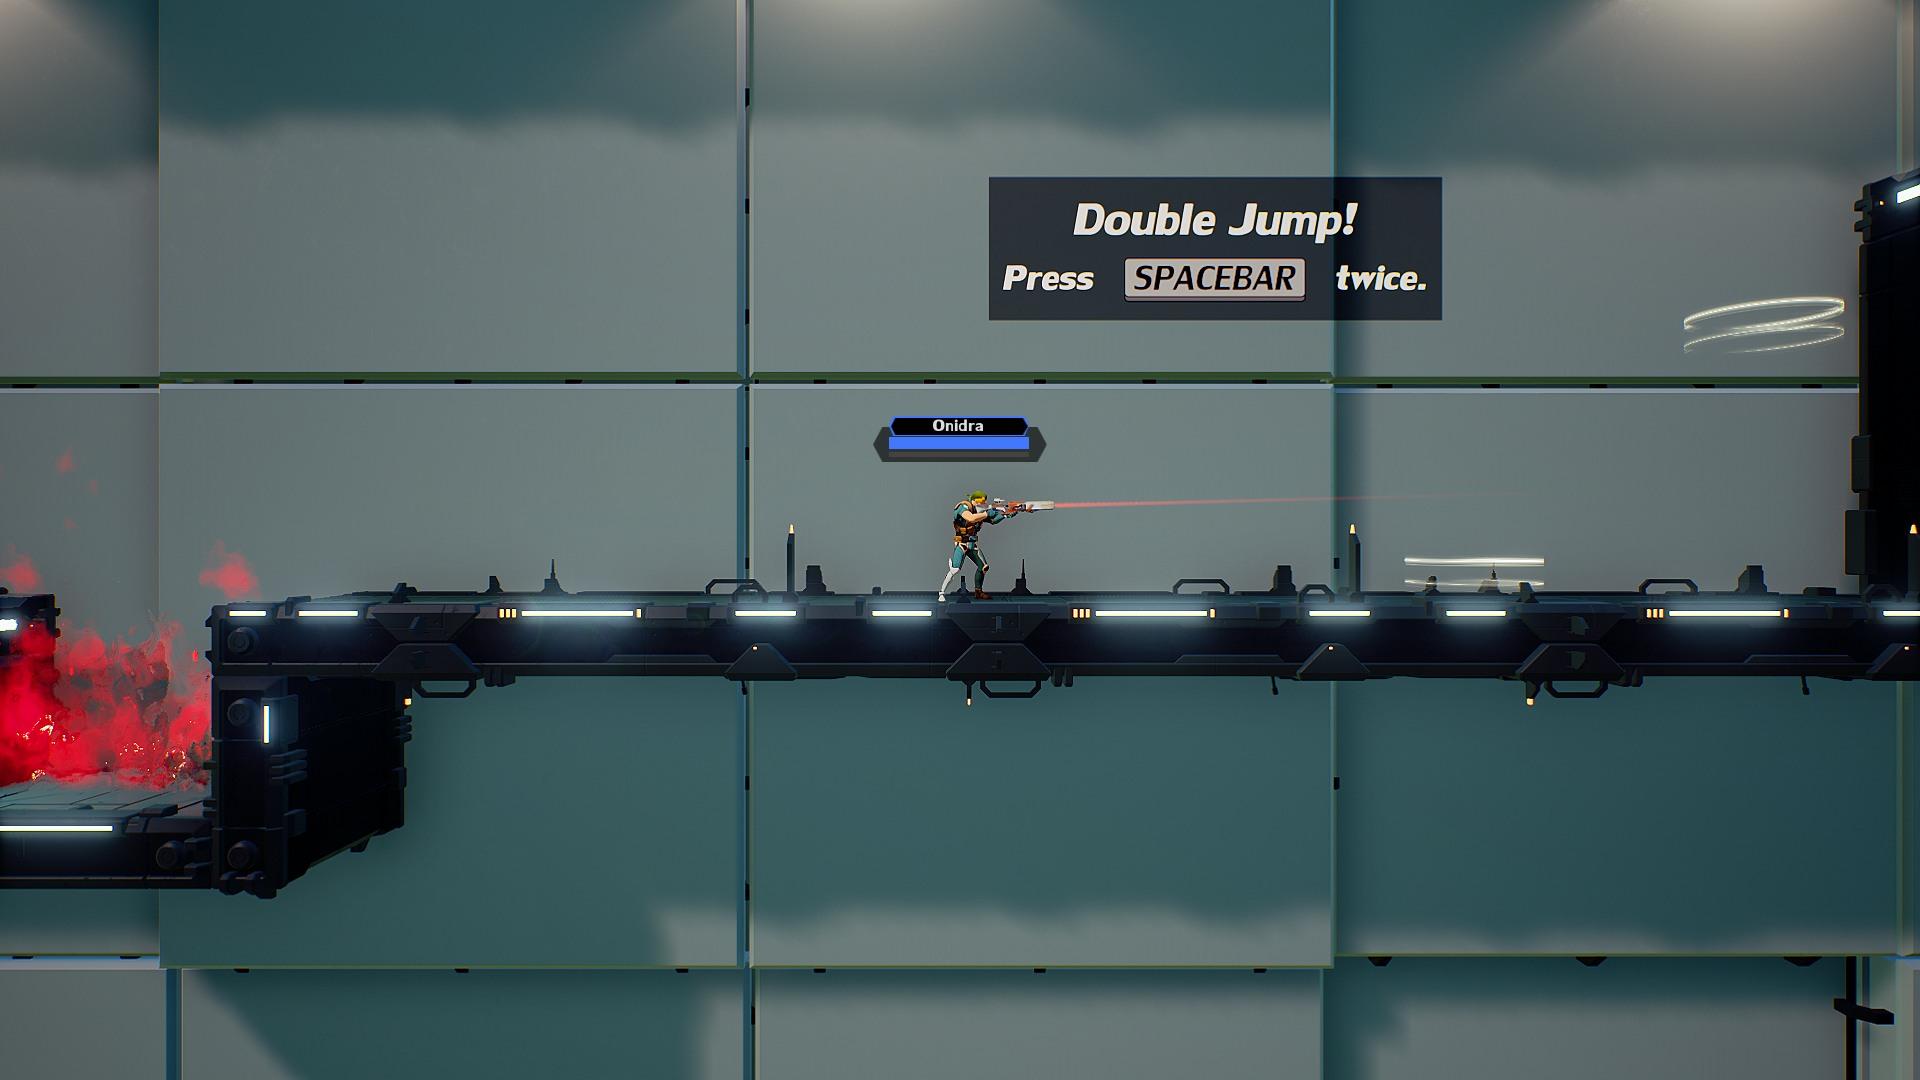 Double équipe pipe